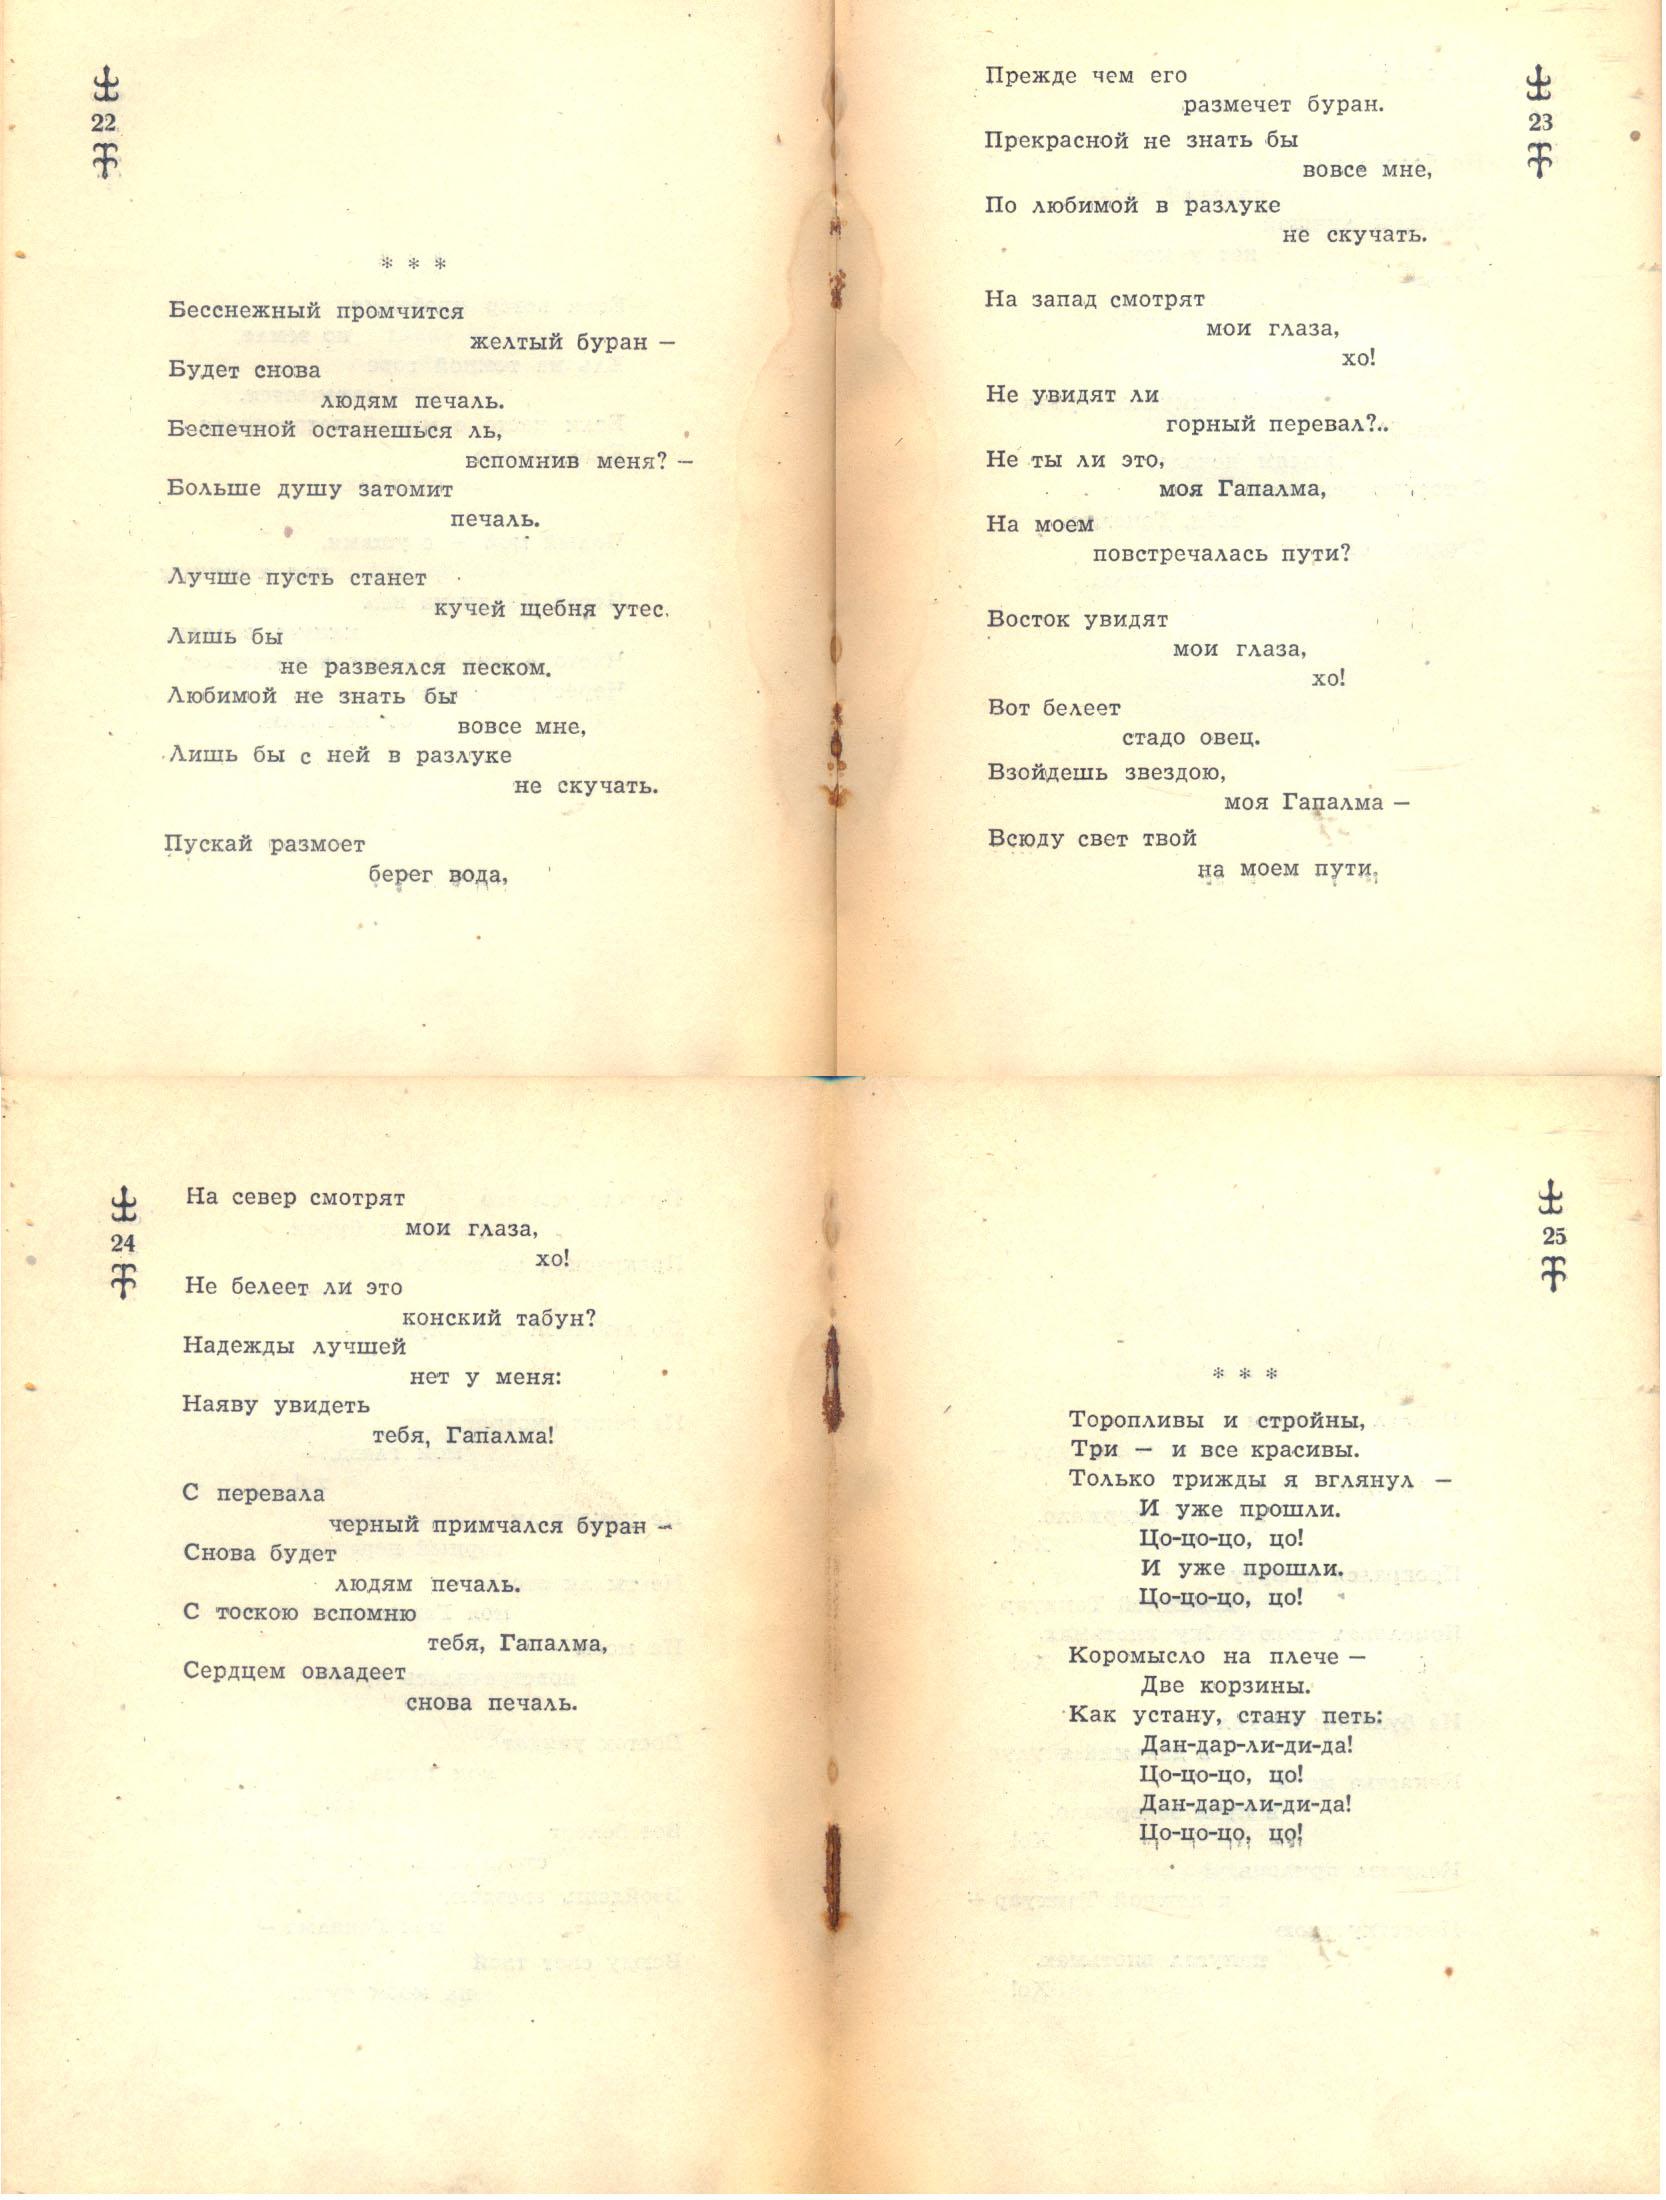 Песни 22-25.jpg